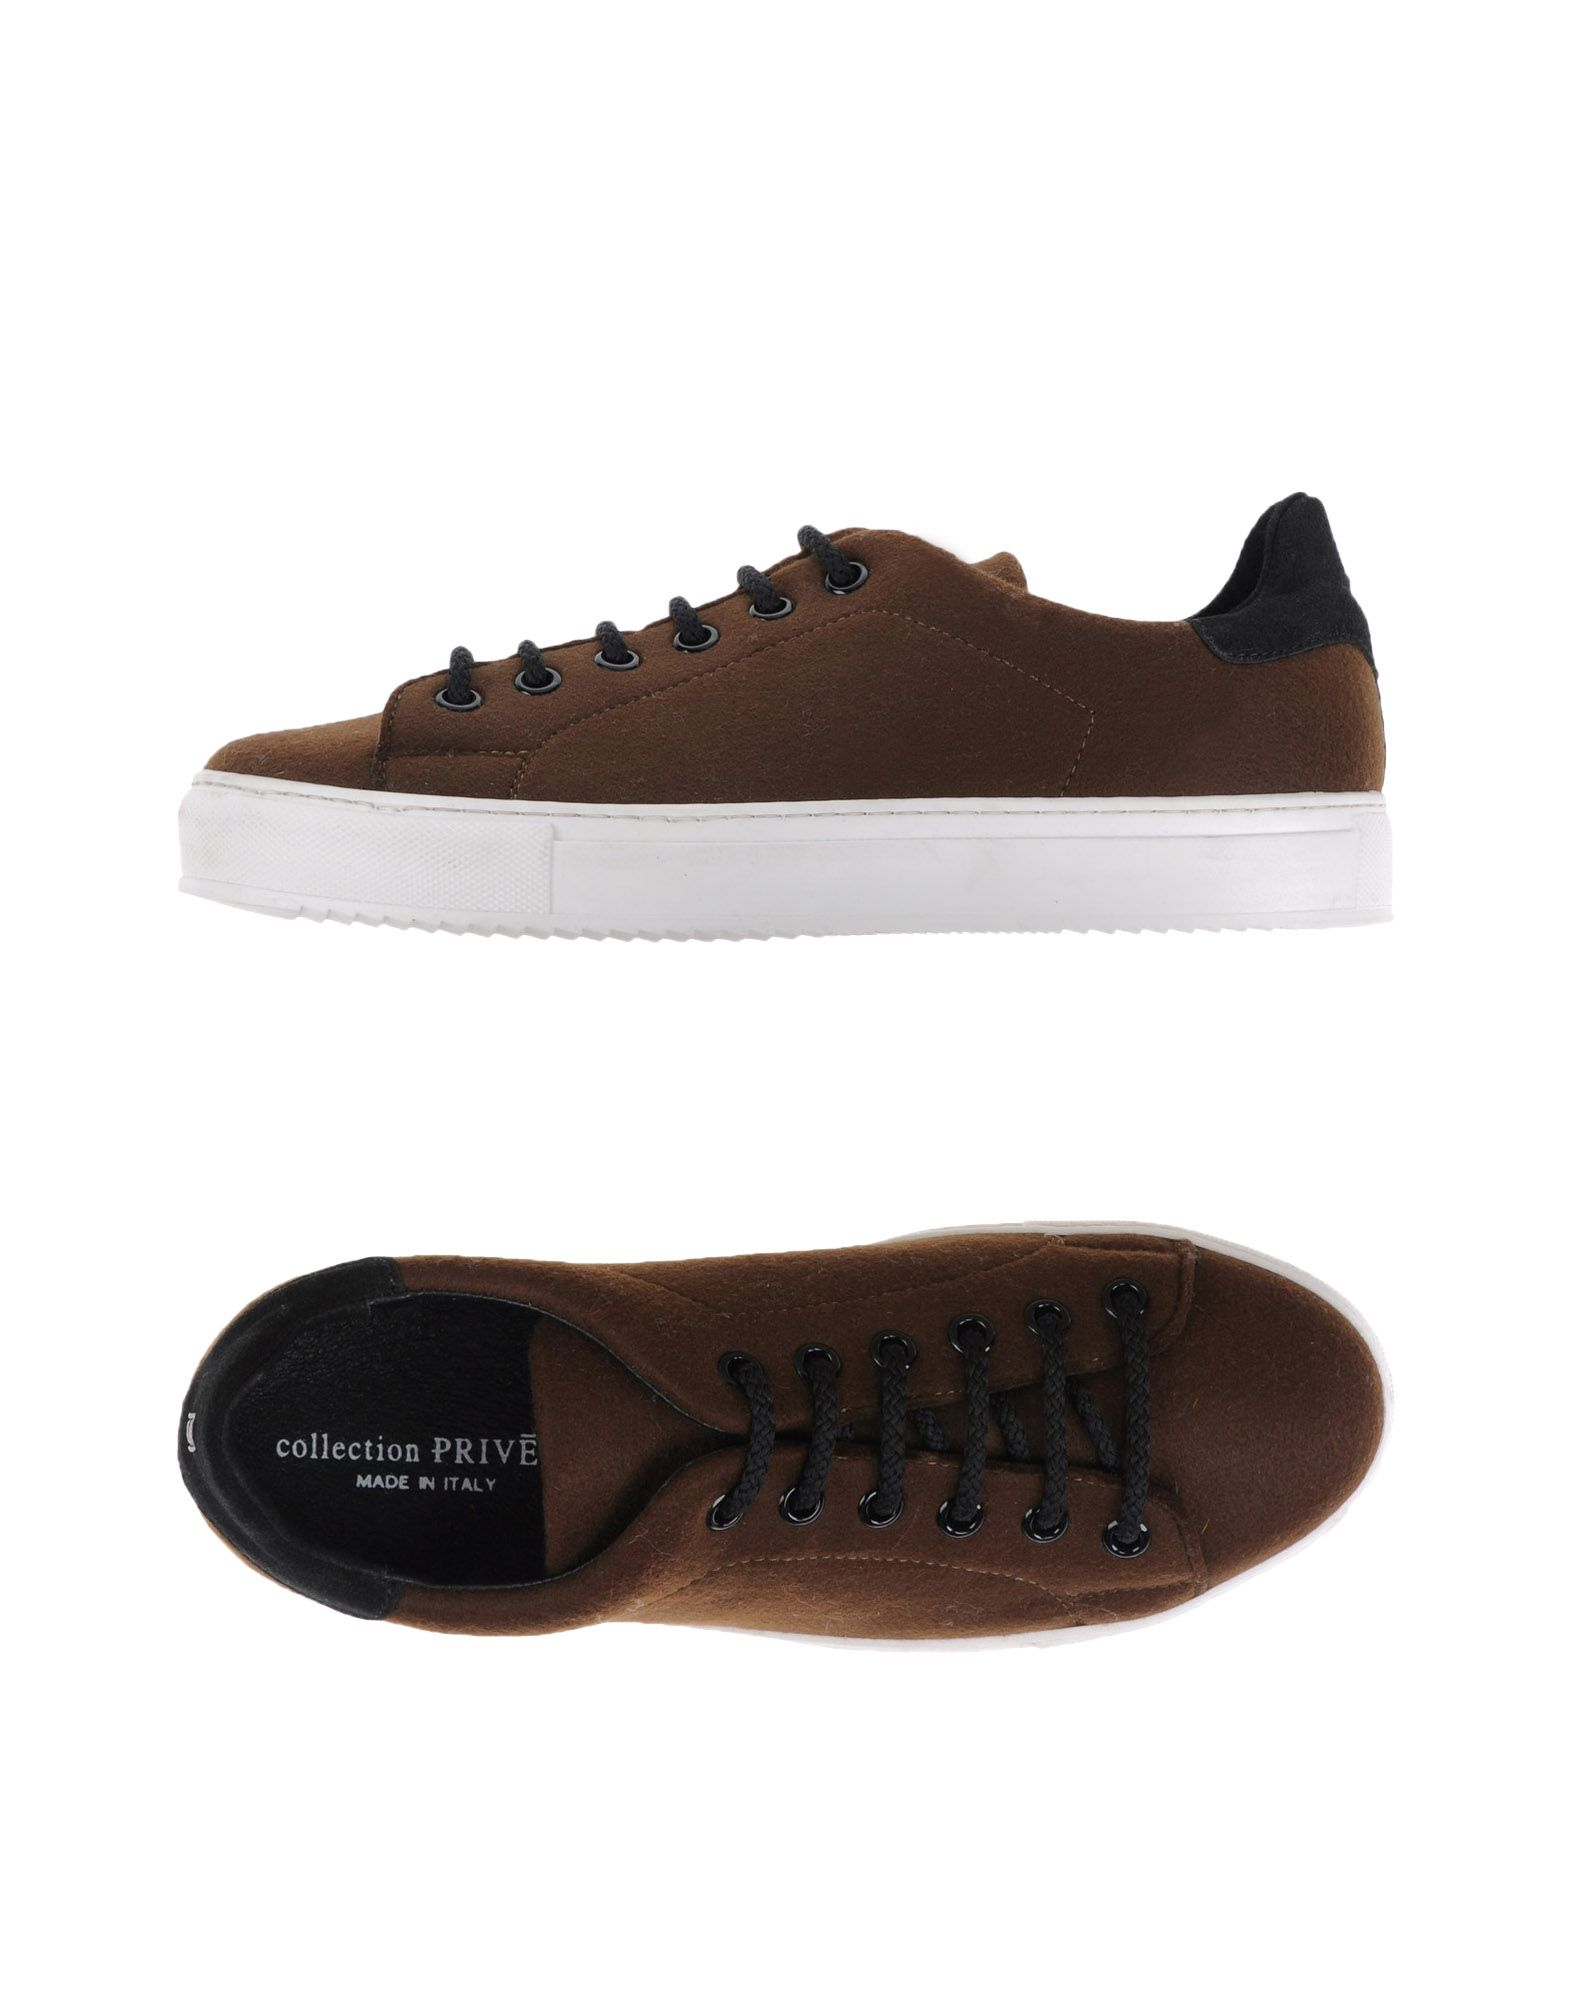 Sneakers Collection Privēe? Uomo - Acquista online su